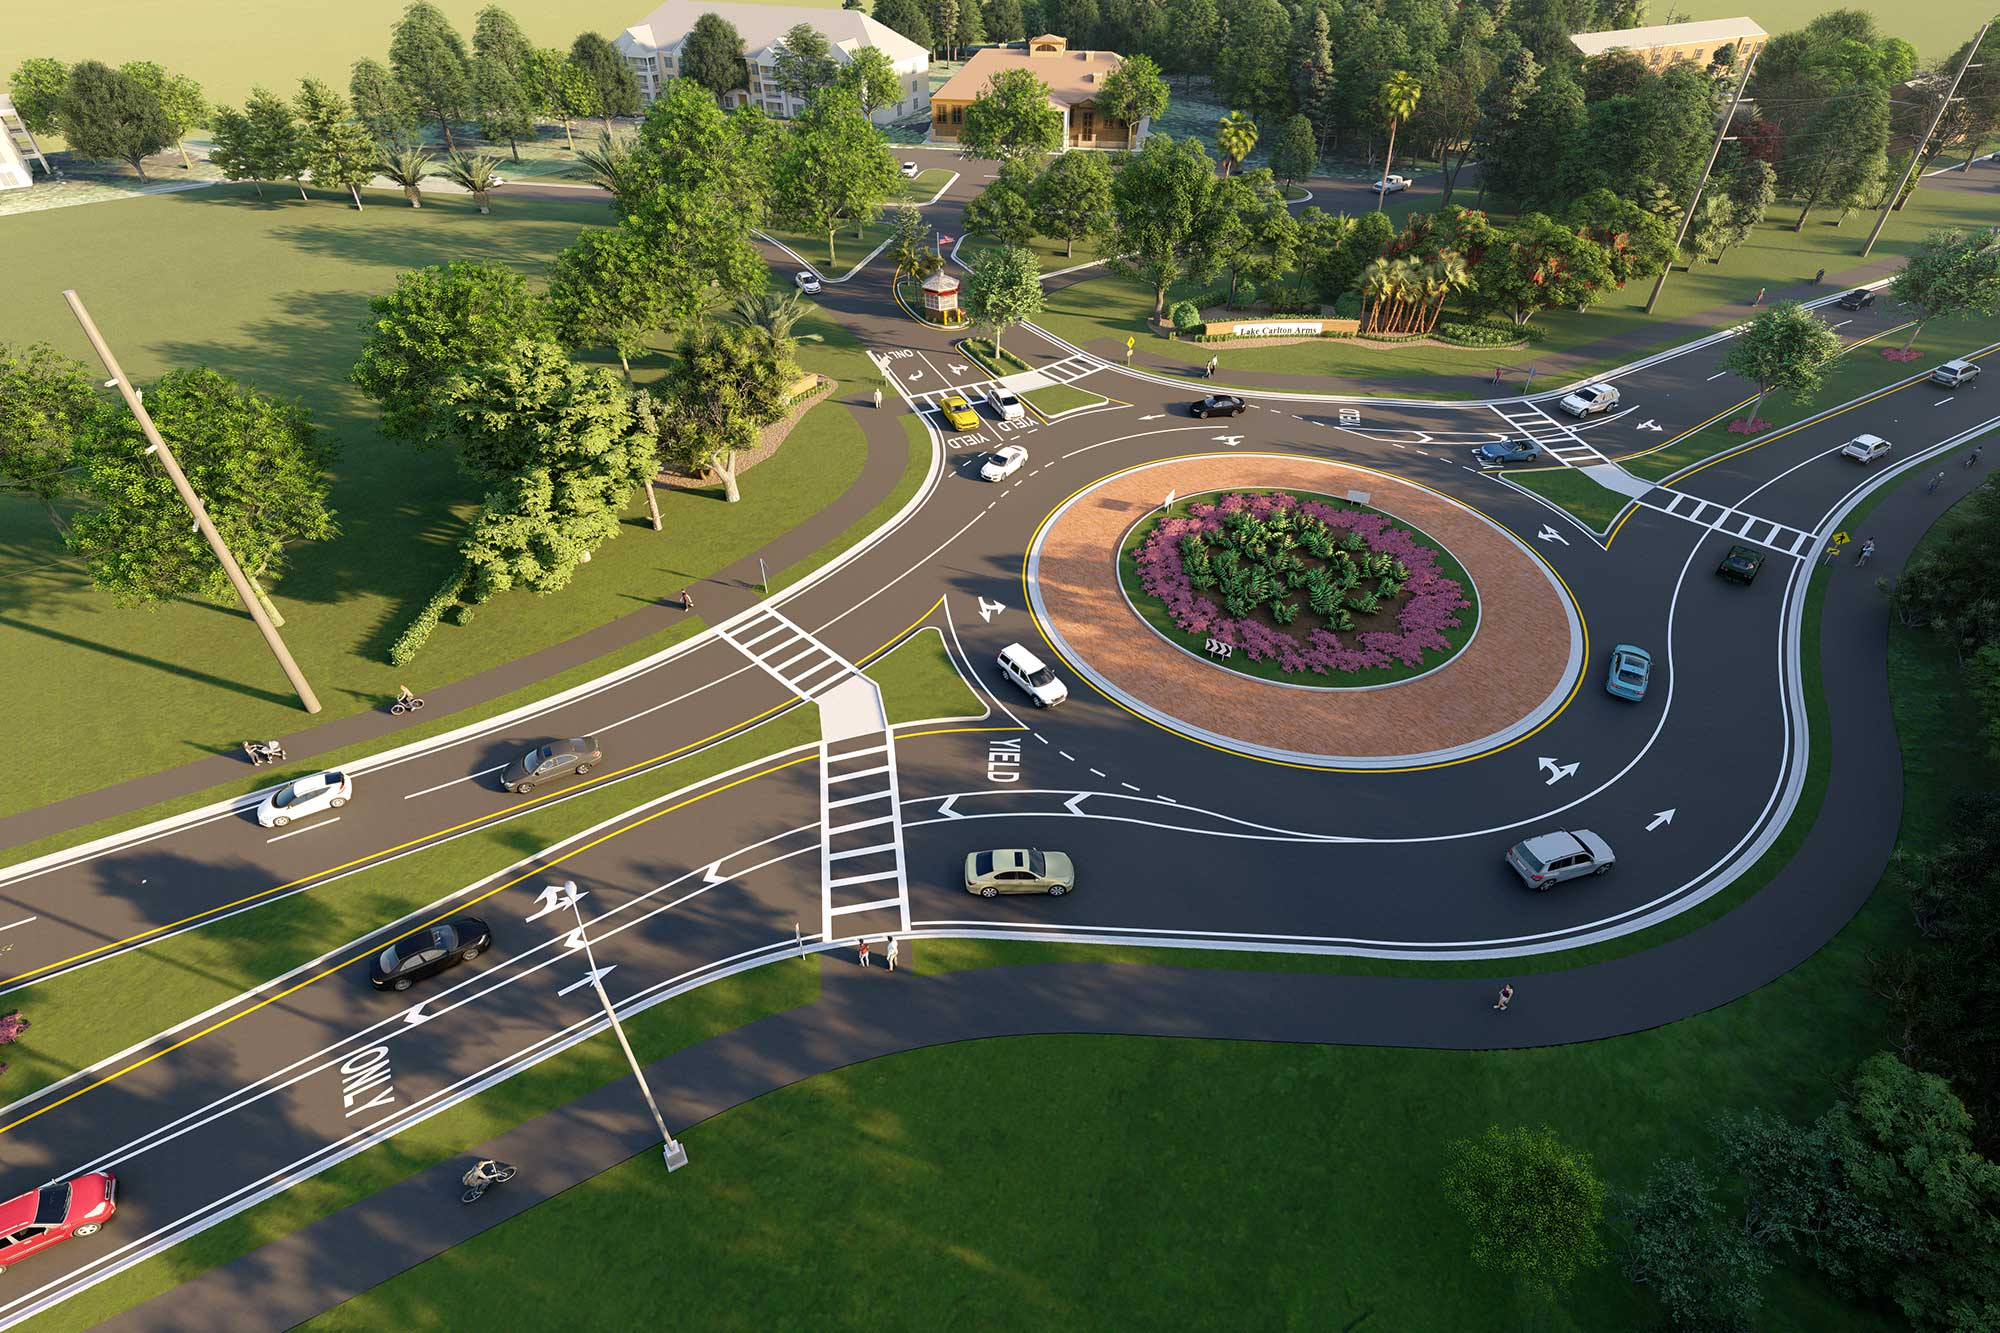 Lake Carlton Roundabout